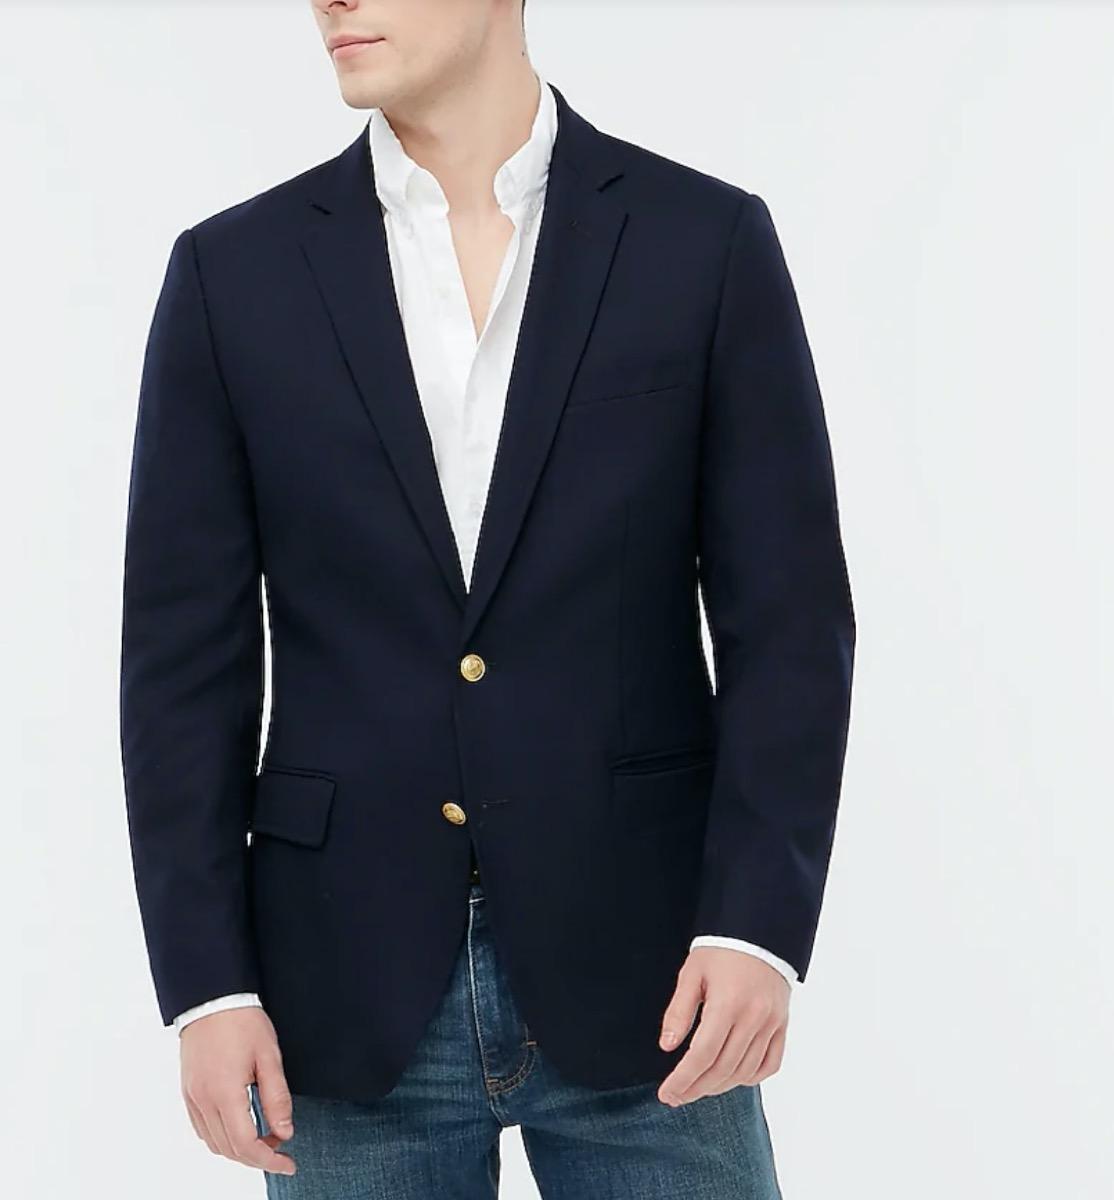 white guy in blue blazer